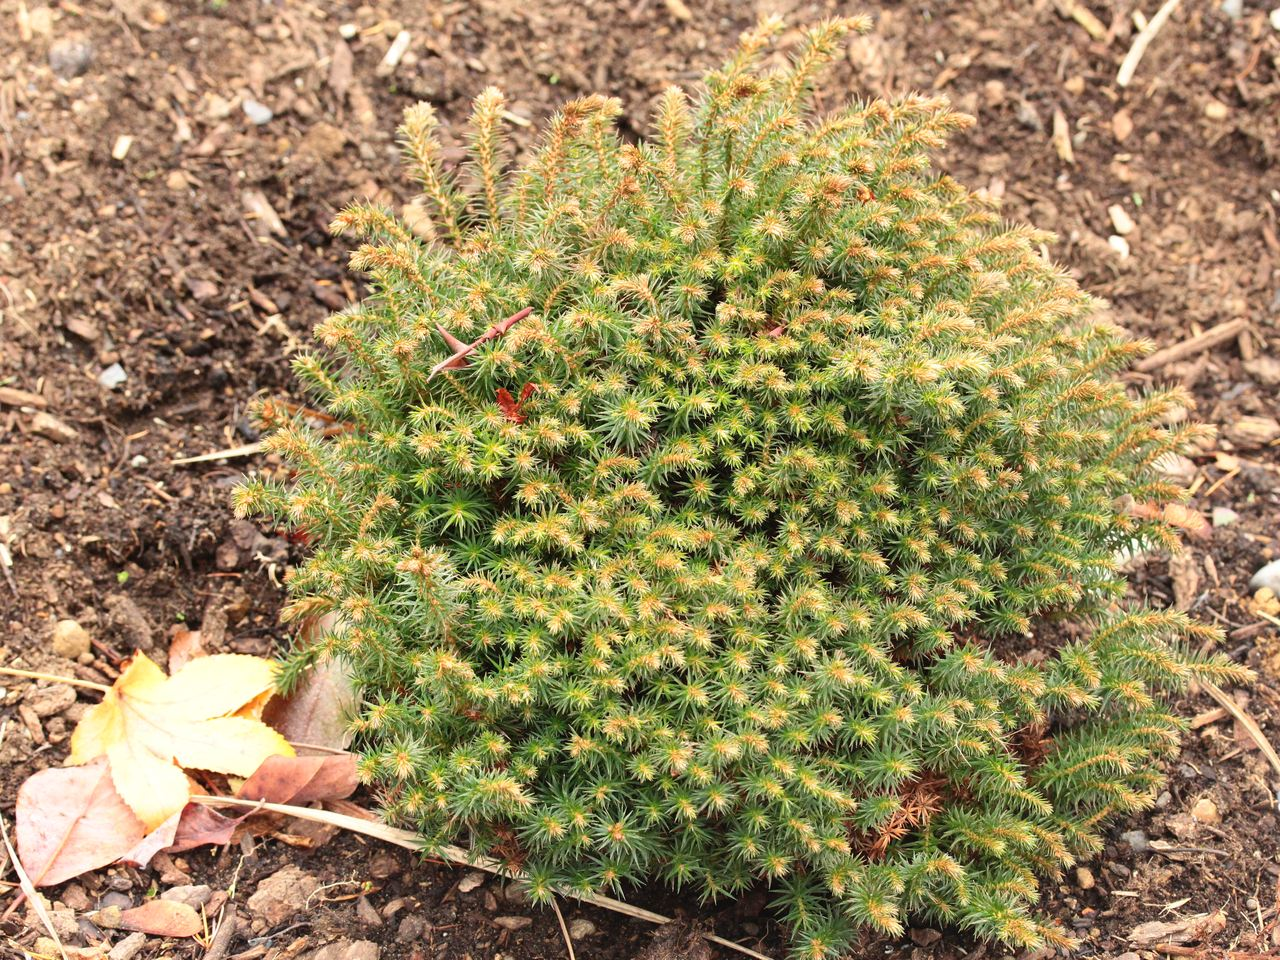 Cunninghamia konishii Little Leo Taiwan coffin fir conifer evergreen miniature cushion round